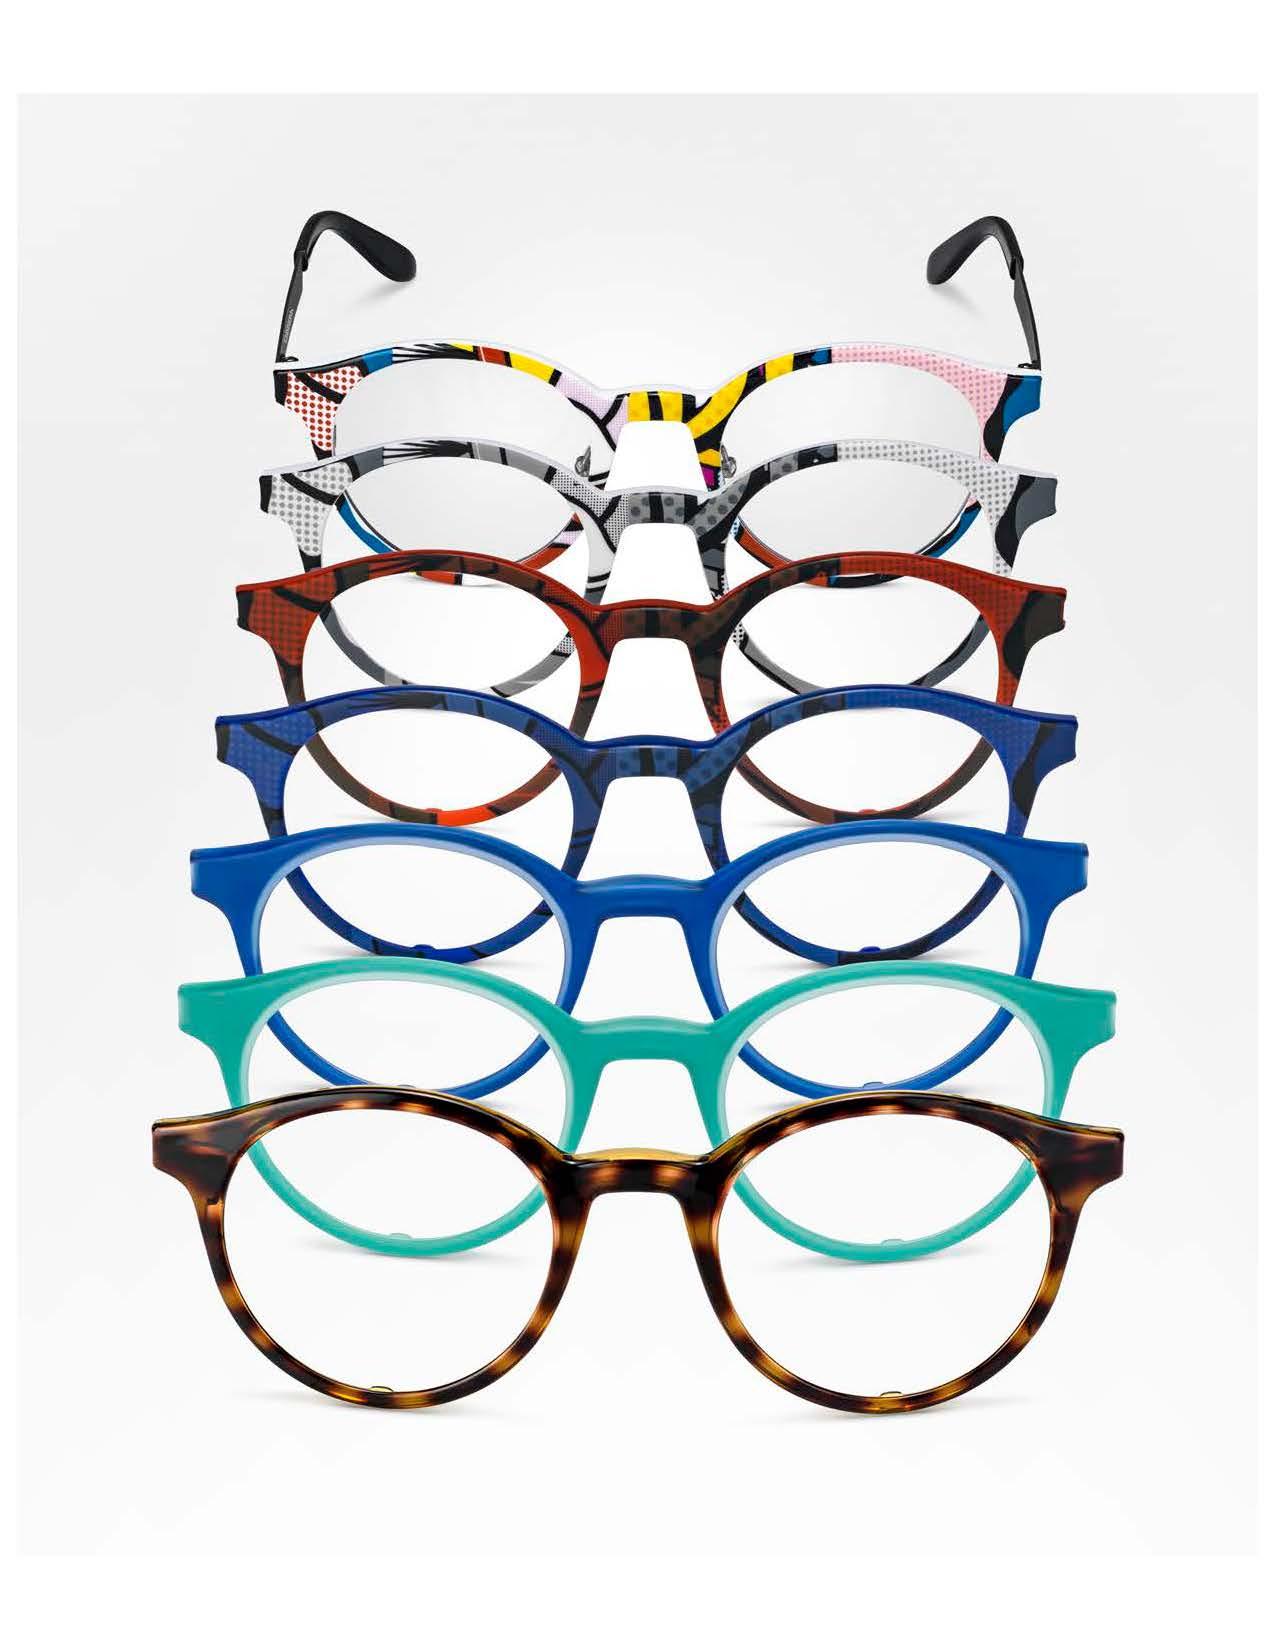 c5f4c171c9fb1 Eyecare Business - Carrera Interchangeable Optical Concept